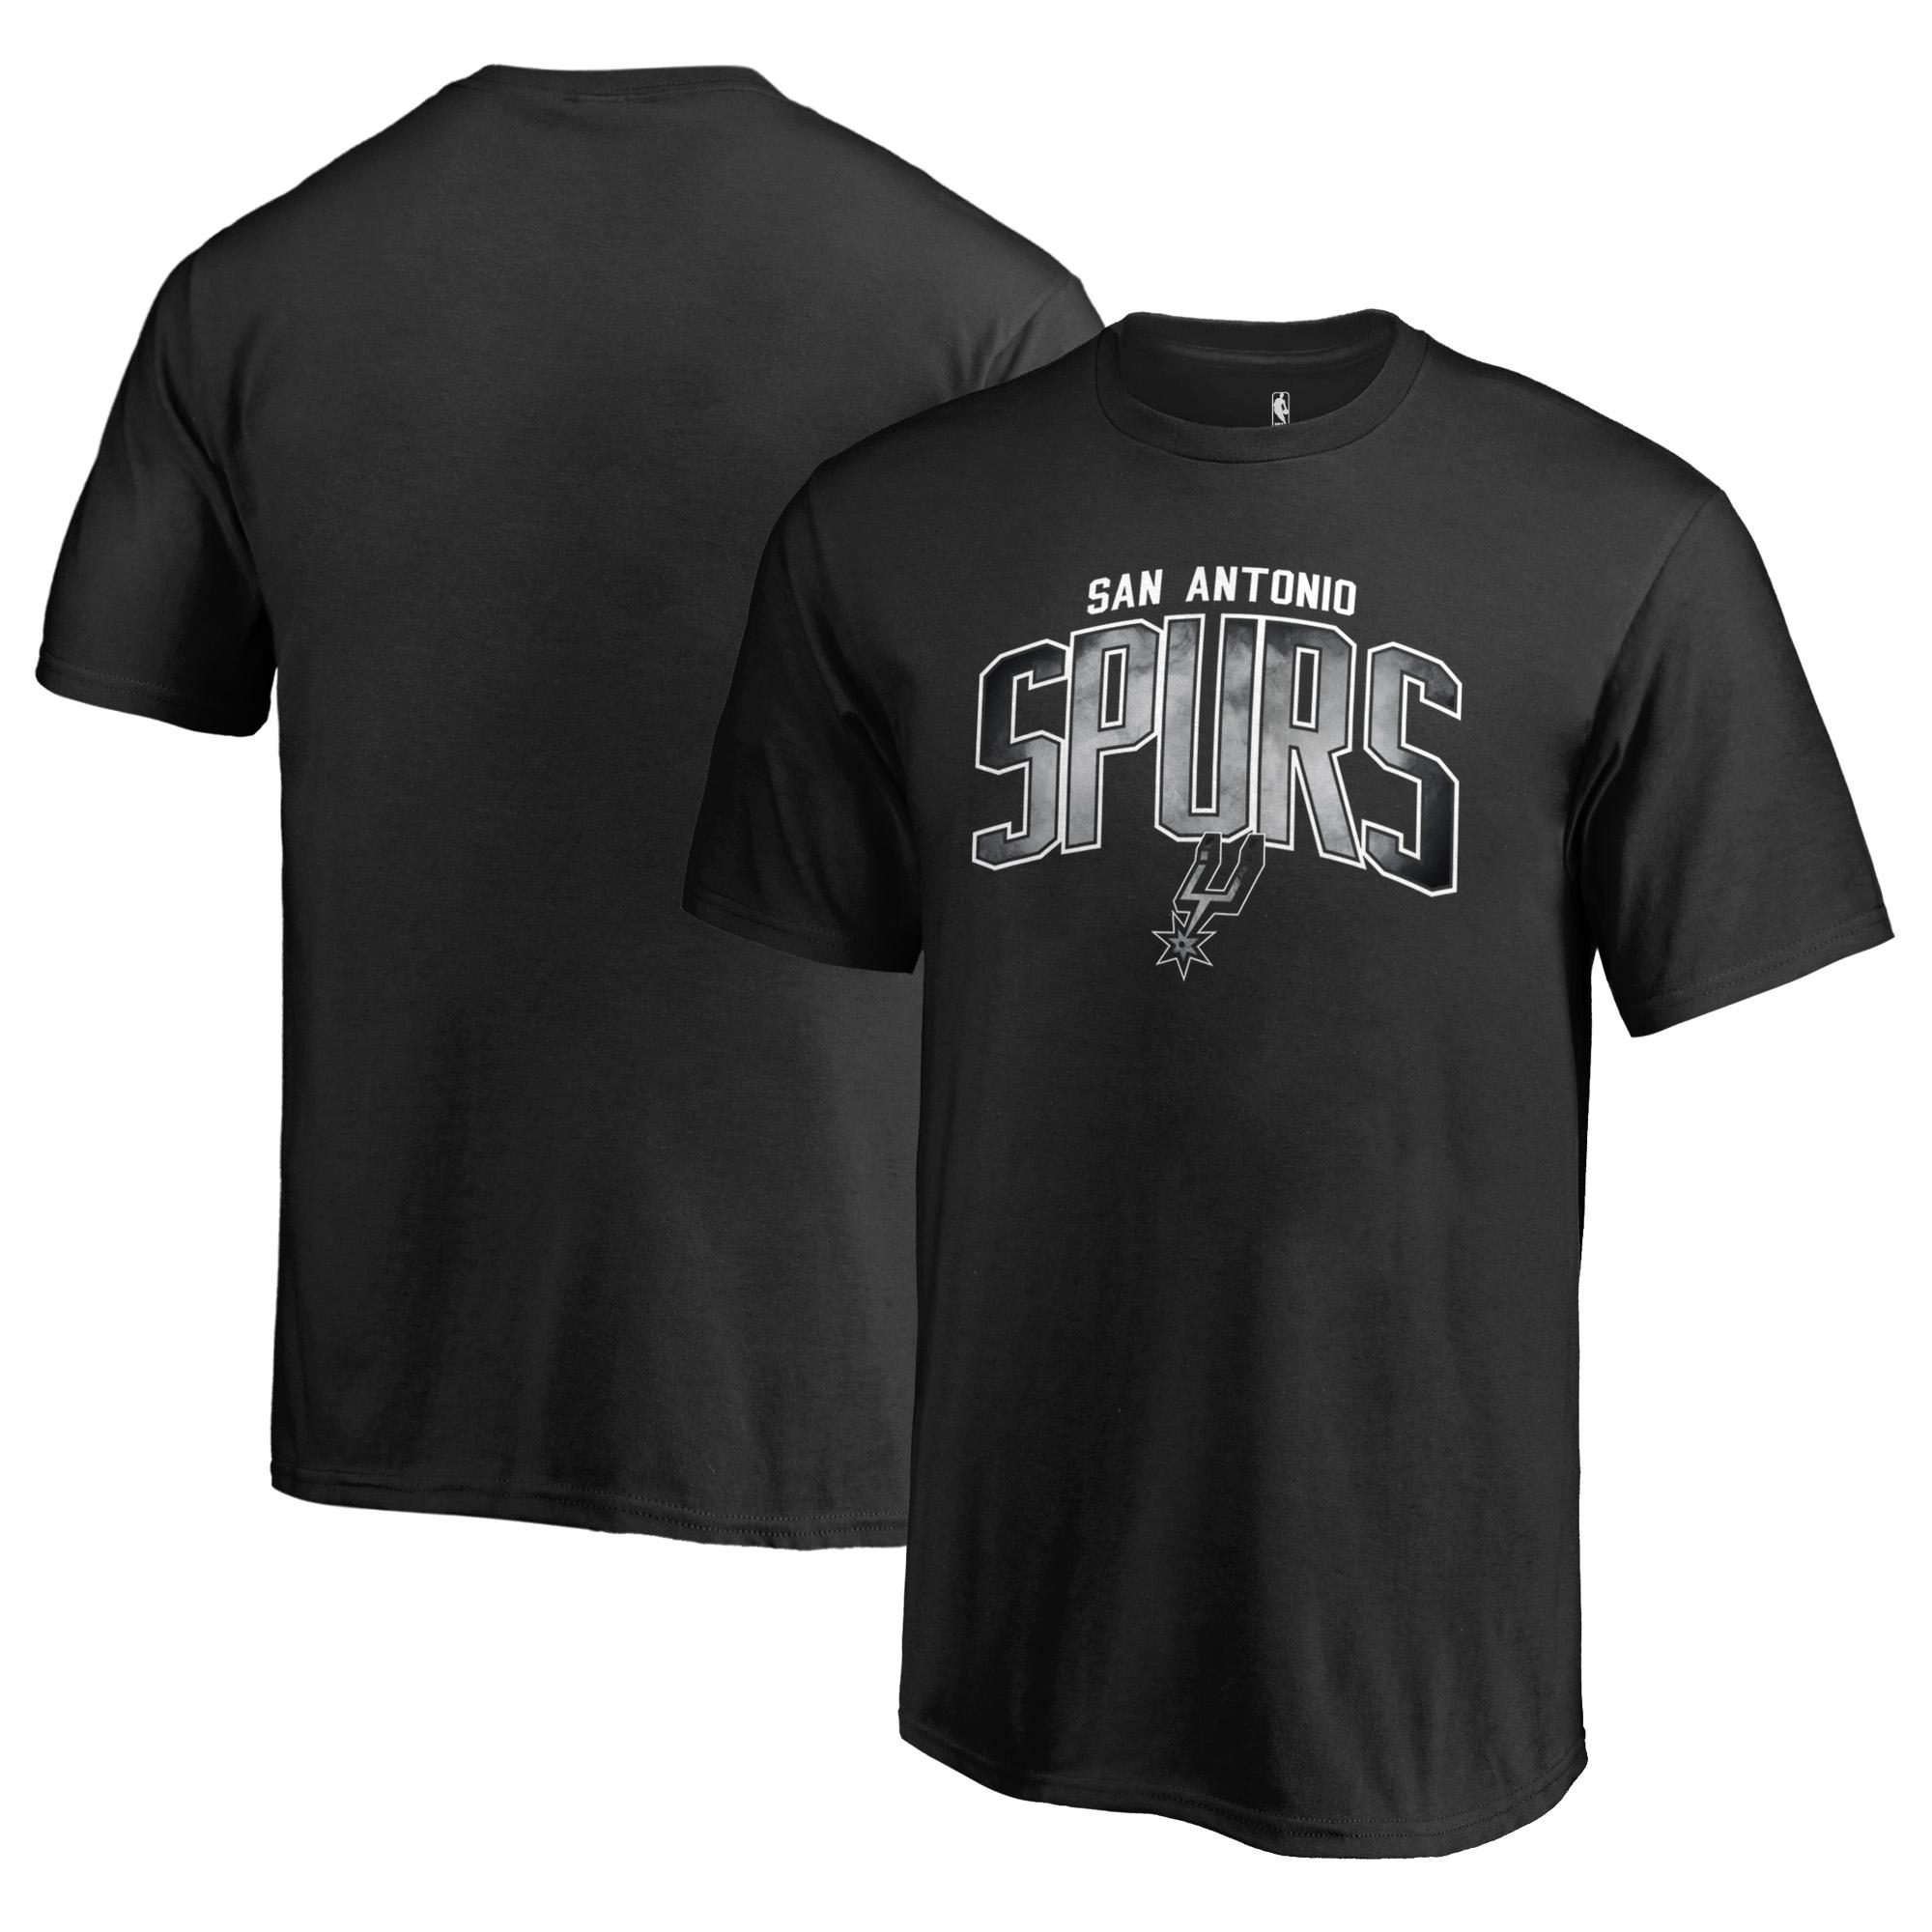 San Antonio Spurs Fanatics Branded Youth Arch Smoke T-Shirt - Black